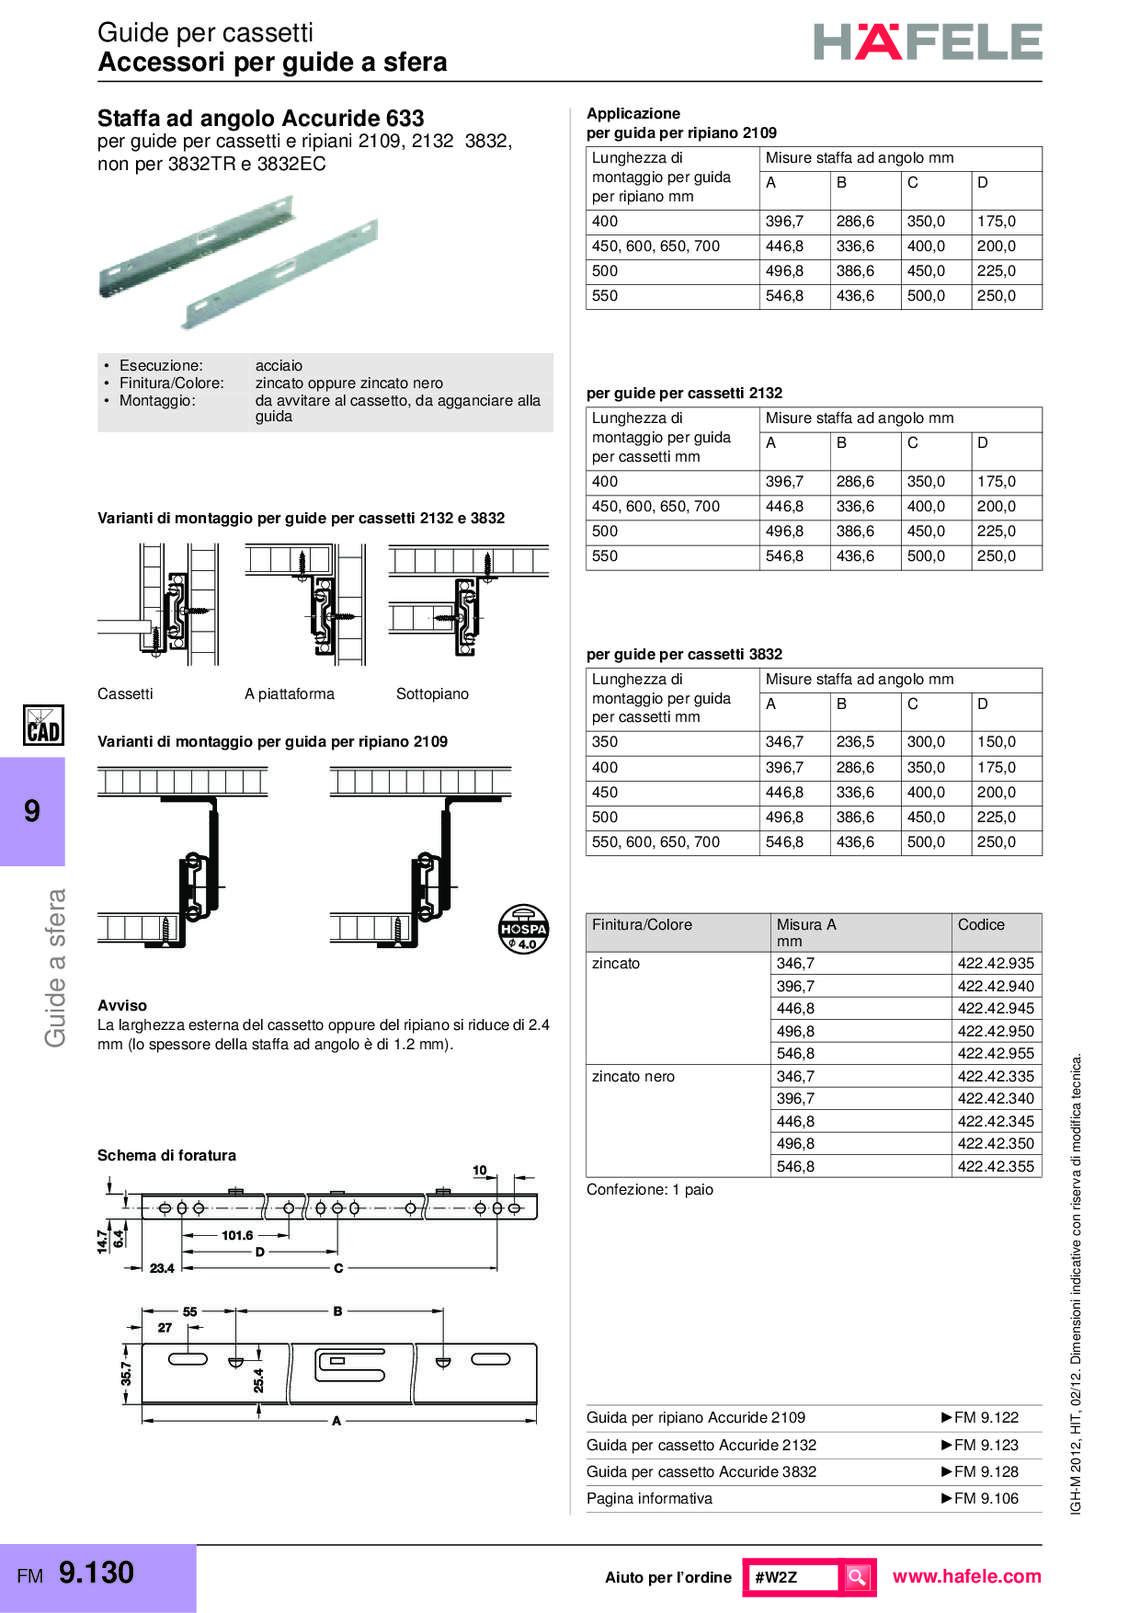 hafele-spondine-e-guide-per-mobili_40_183.jpg